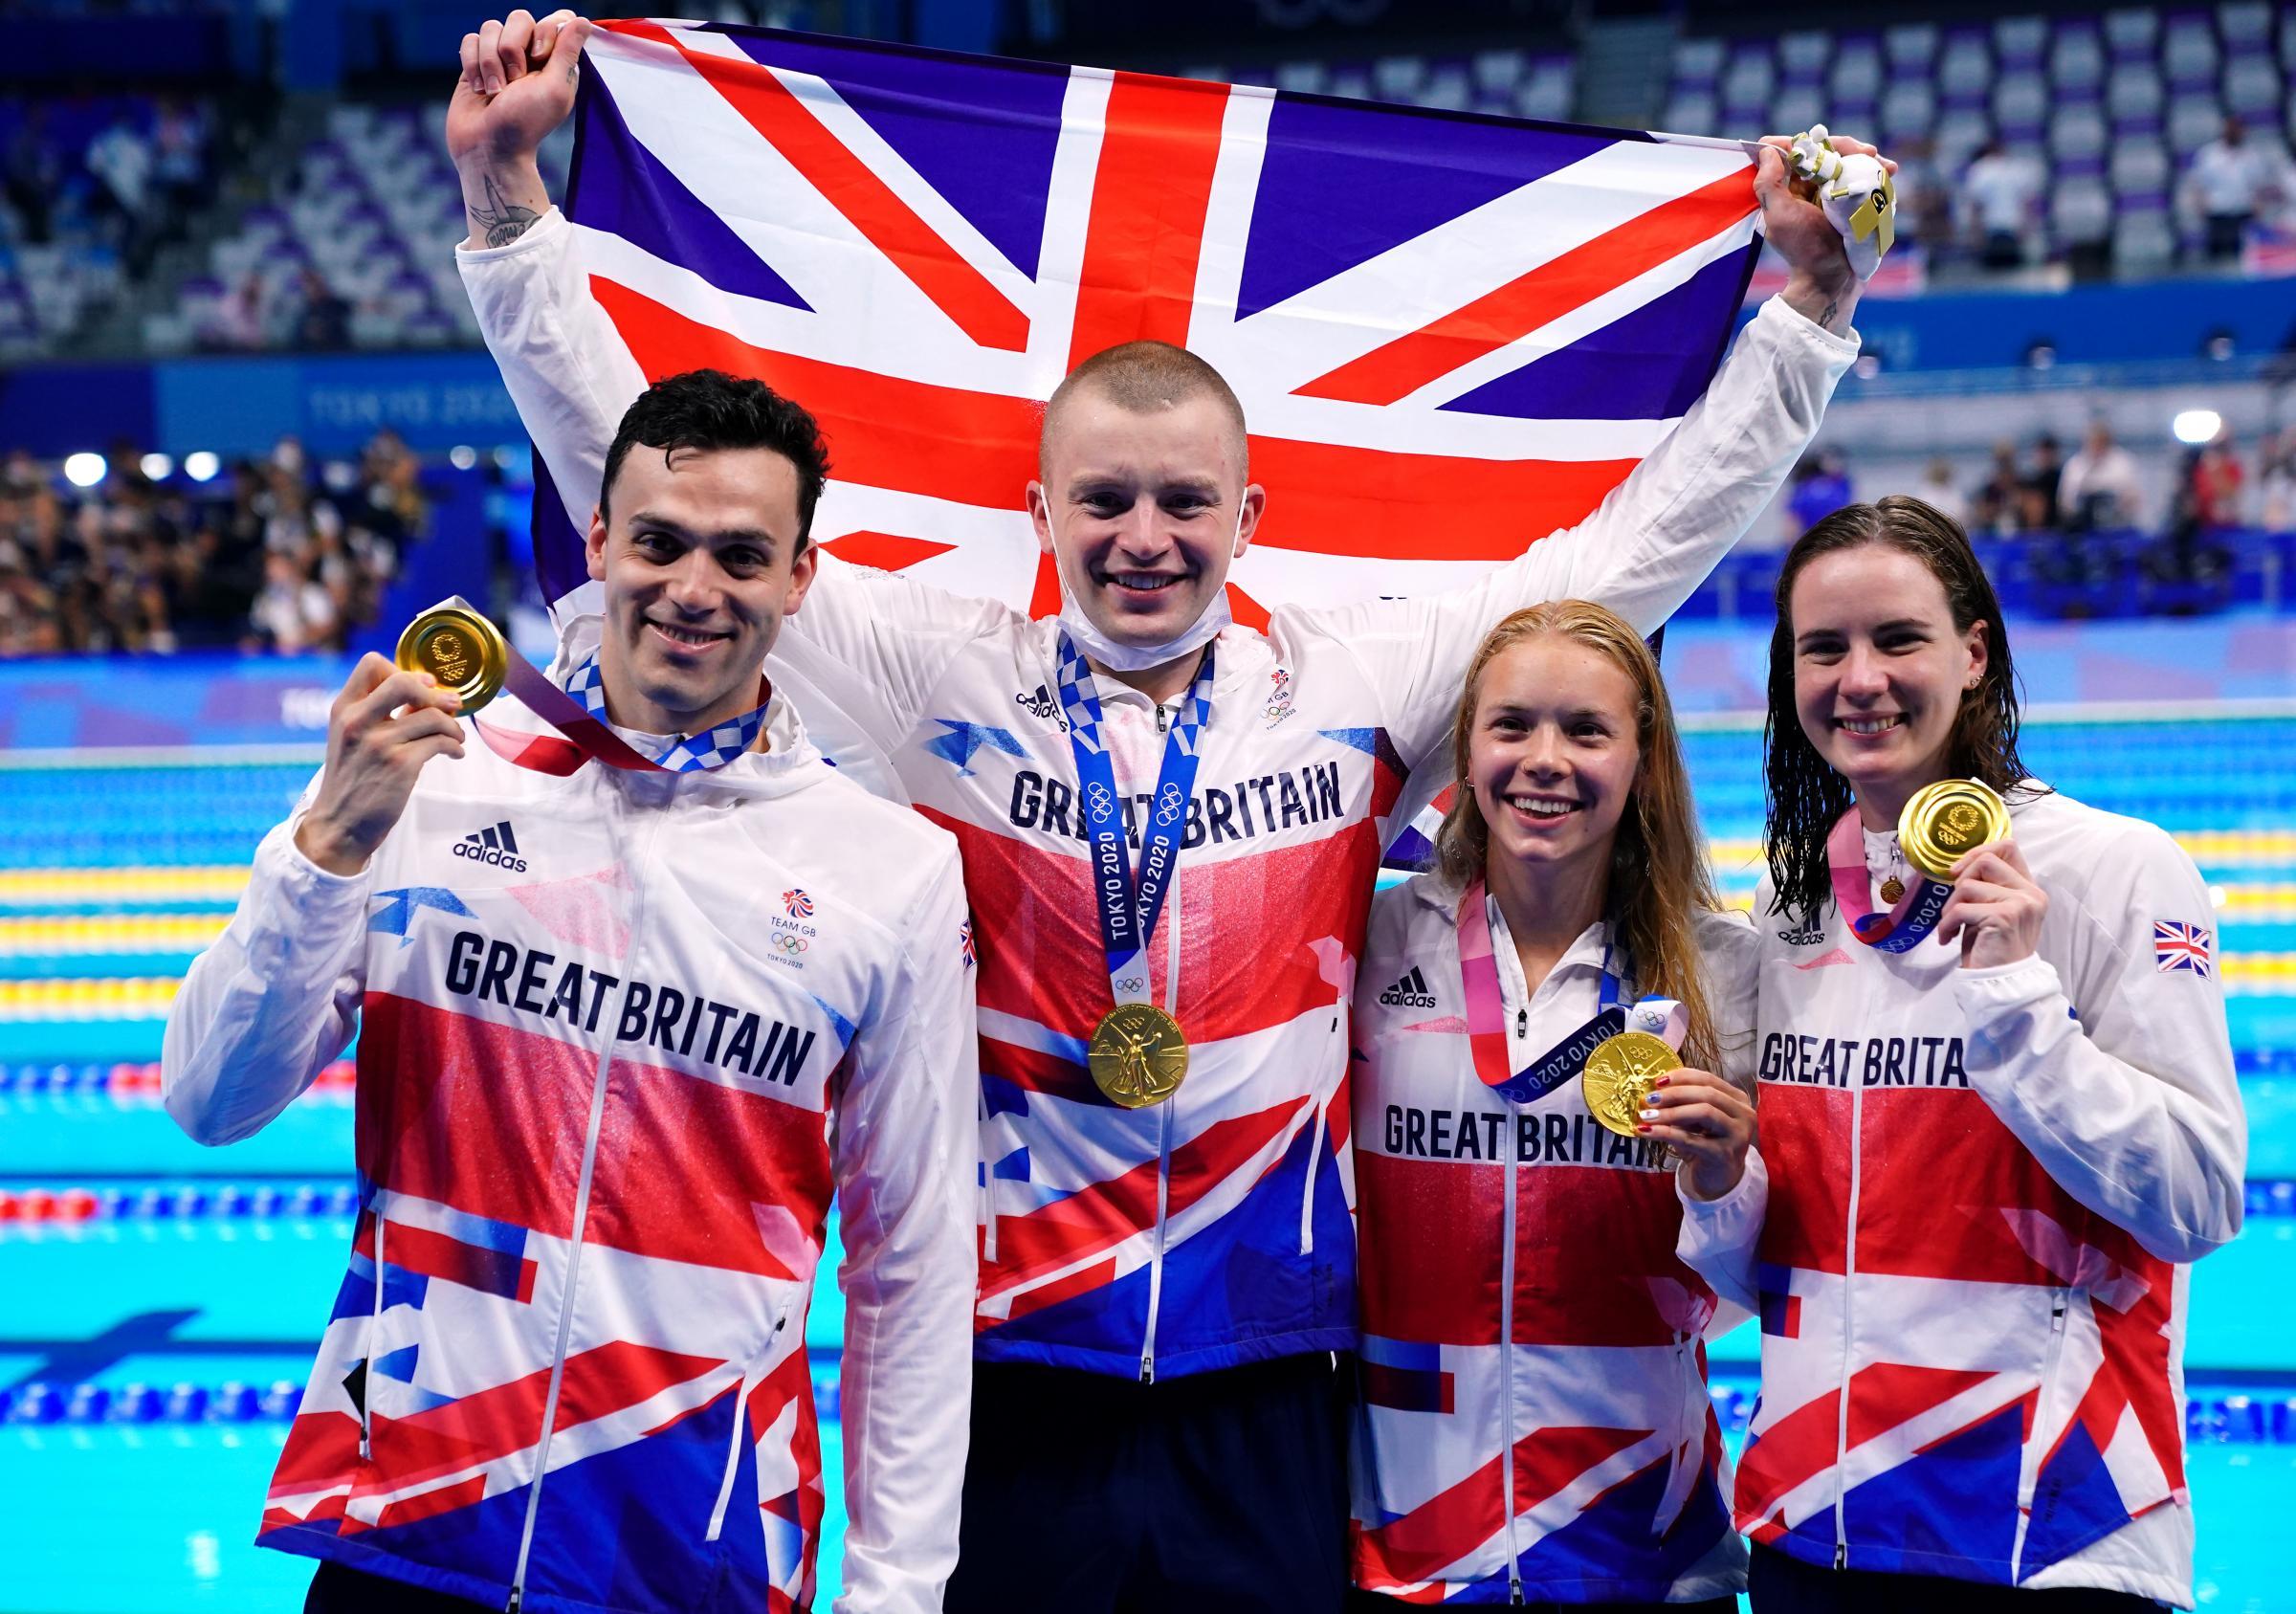 Peaty, Guy, Dawson and Hopkin Team GB gold at Tokyo Olympics